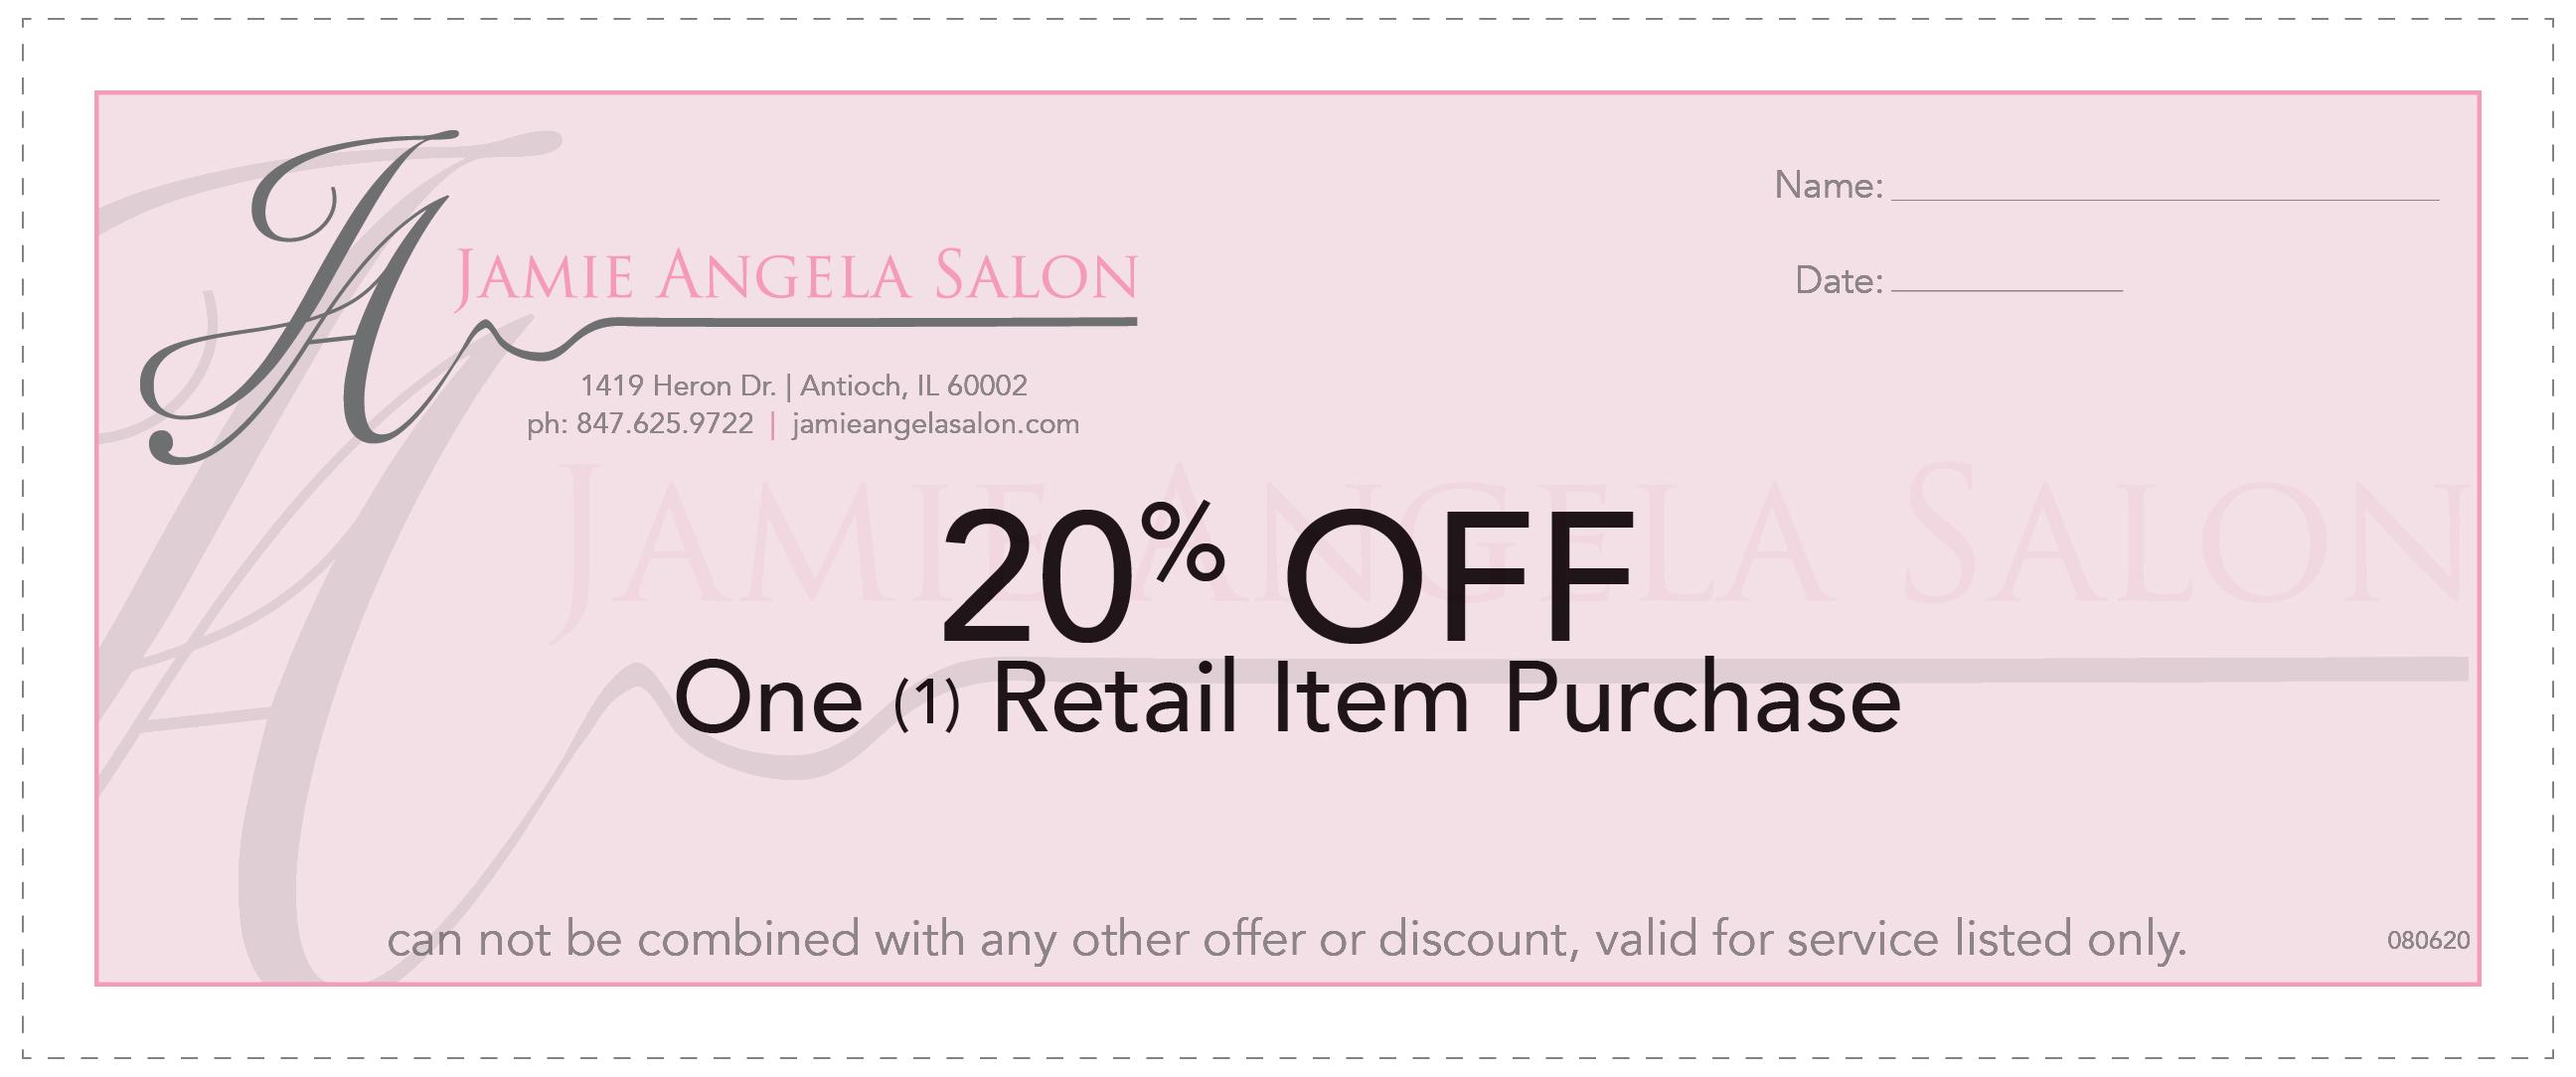 jamie-angela-salon-retailitem-coupon